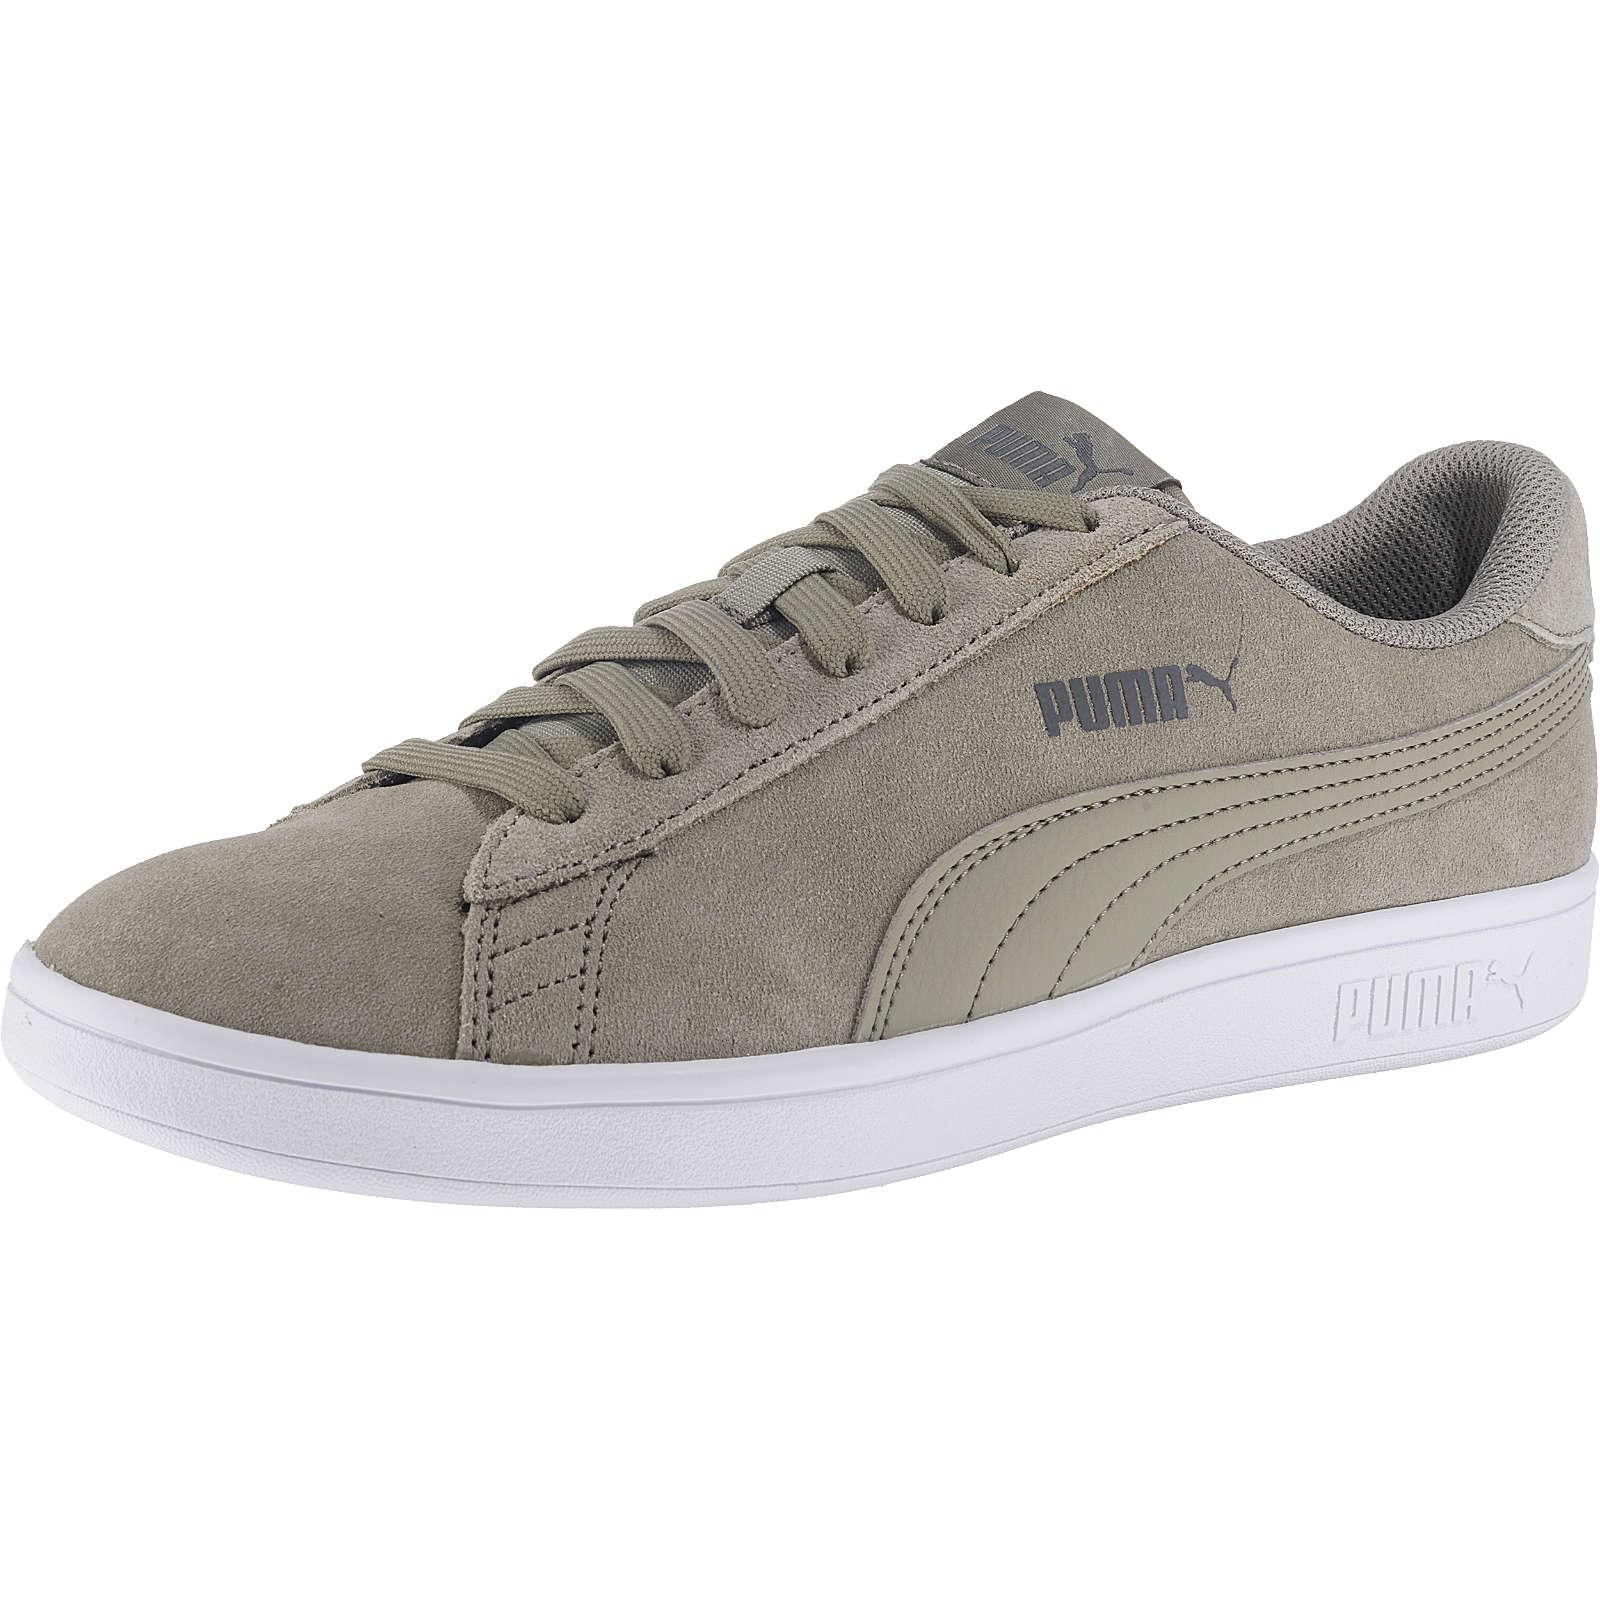 Puma Smash v2 Sneakers Low grau Herren Gr. 44